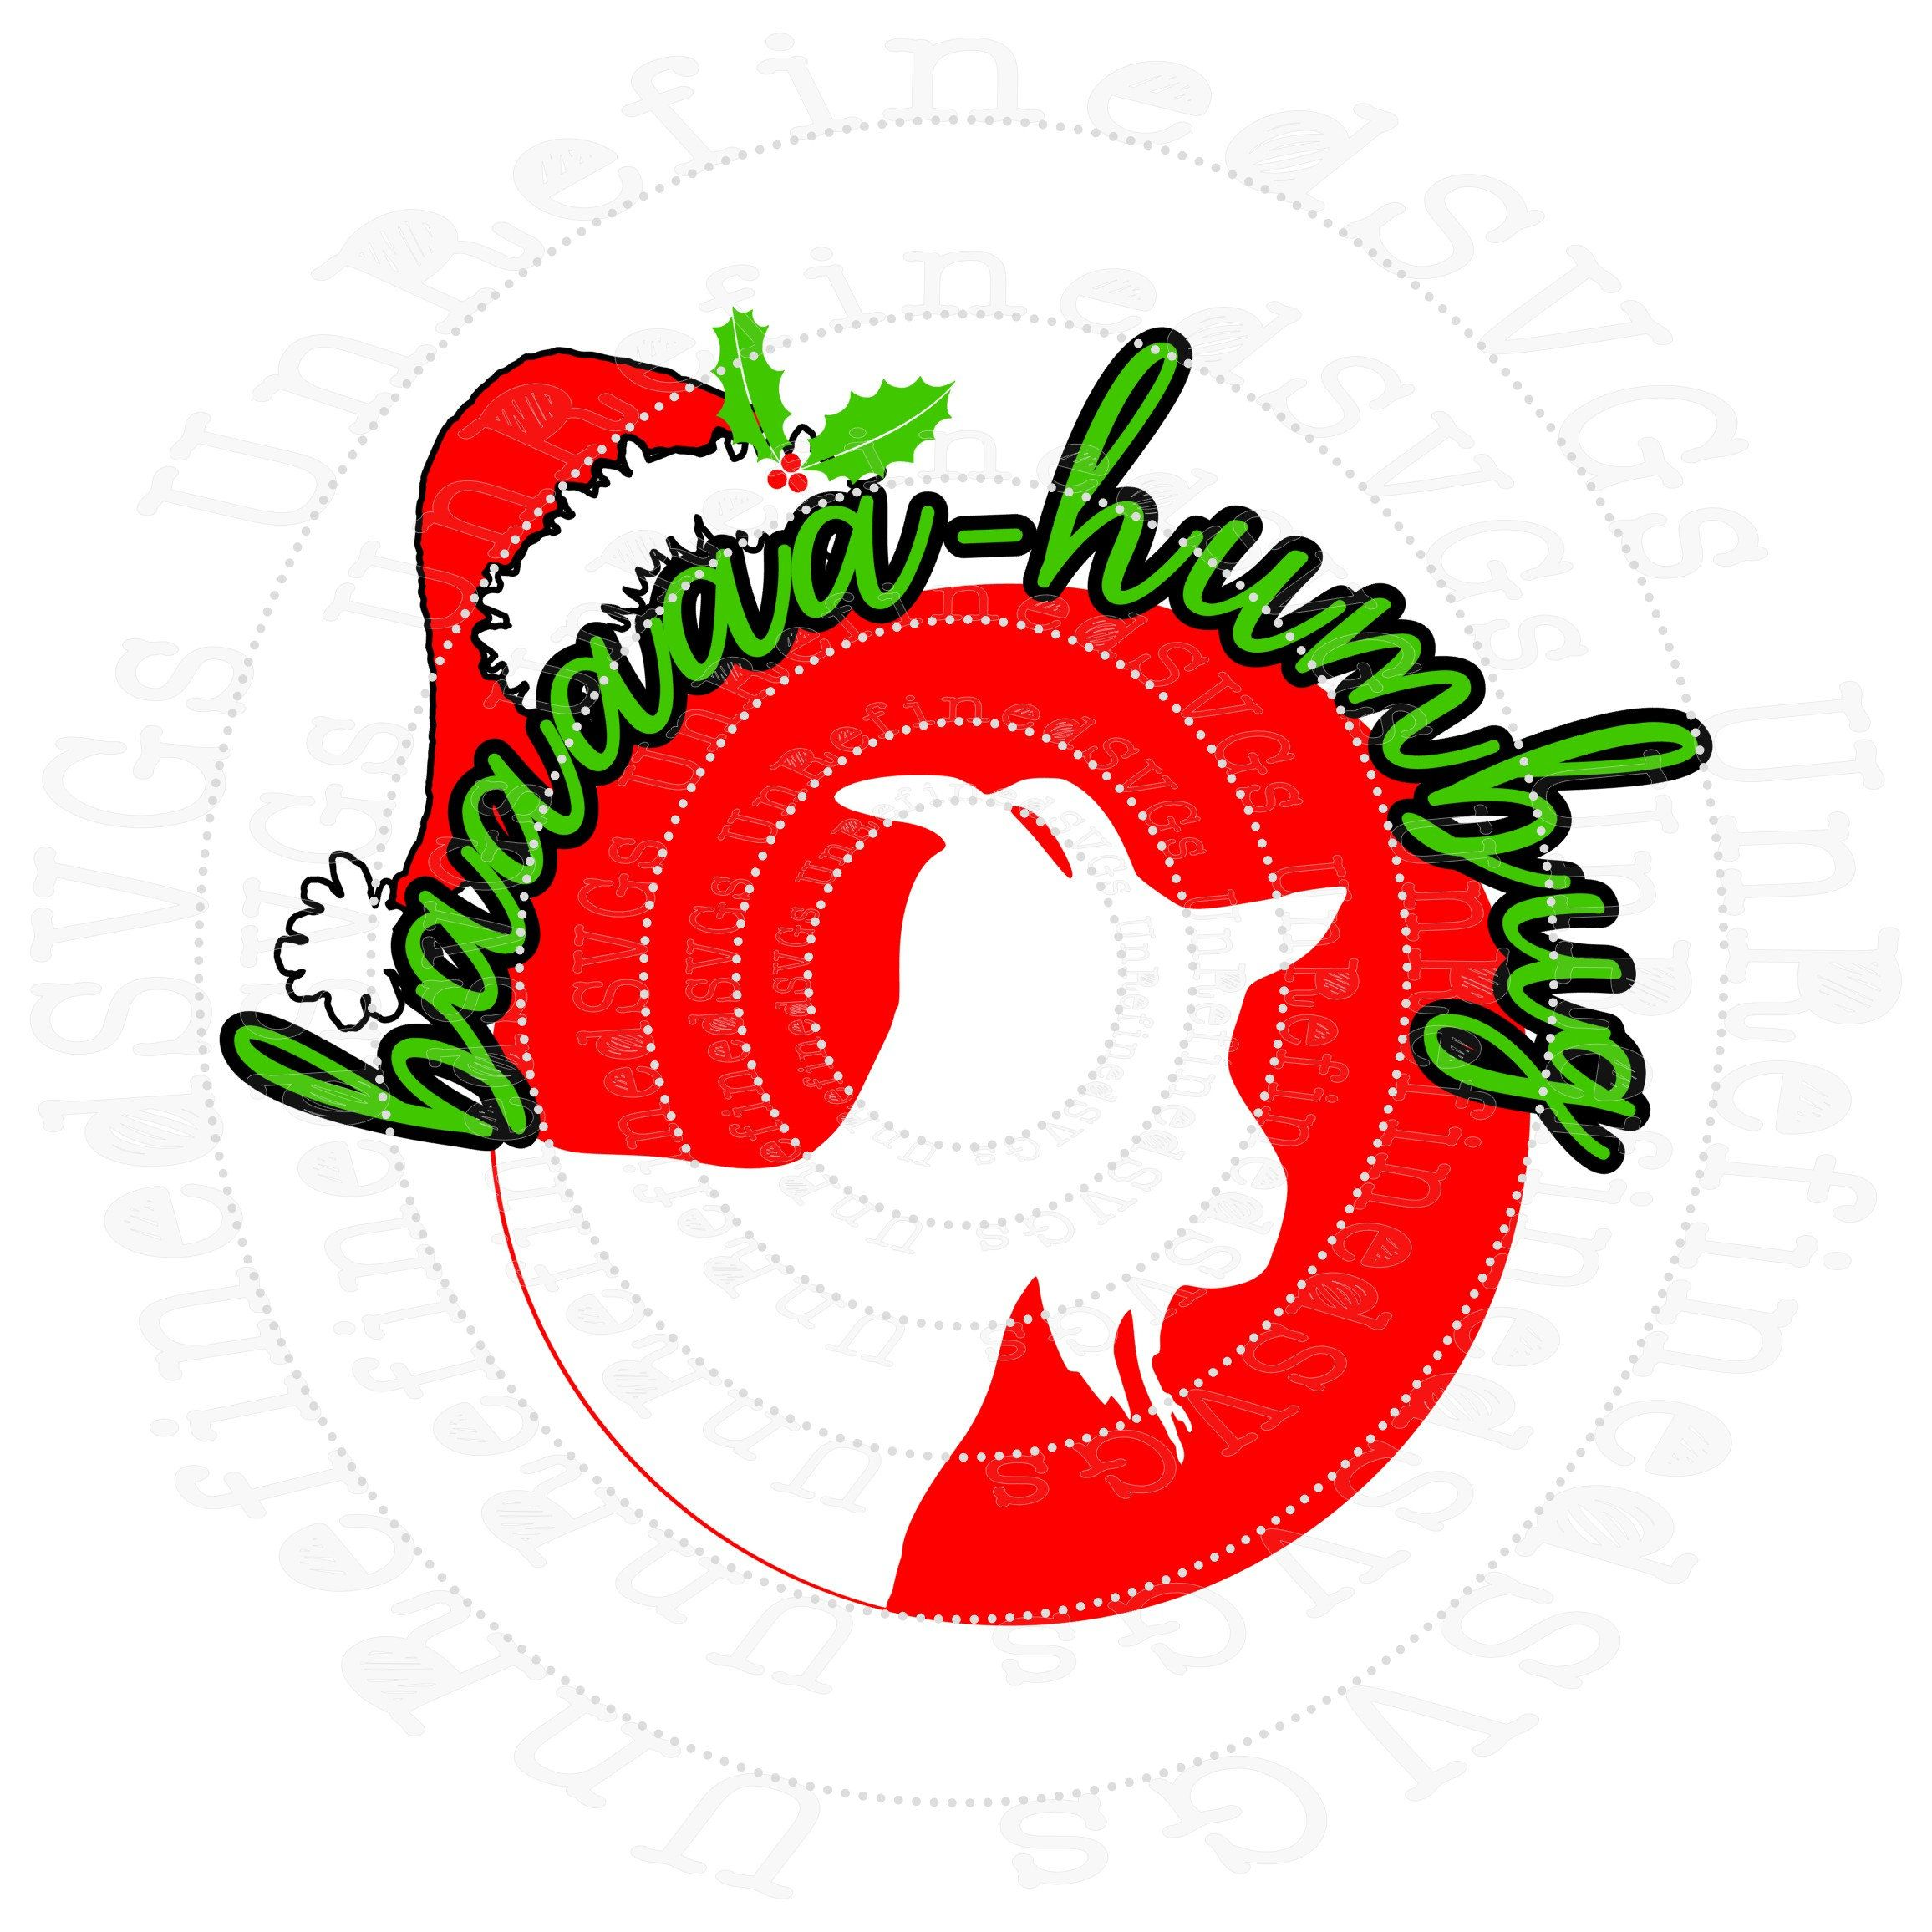 Bah Humbug Svg Baaaaa Humbug Goat Christmas Svg I M Just Here For The Goats Digital Design File Dxf Pdf Png Jpg Christmas Svg Christmas Svg Files Clip Art